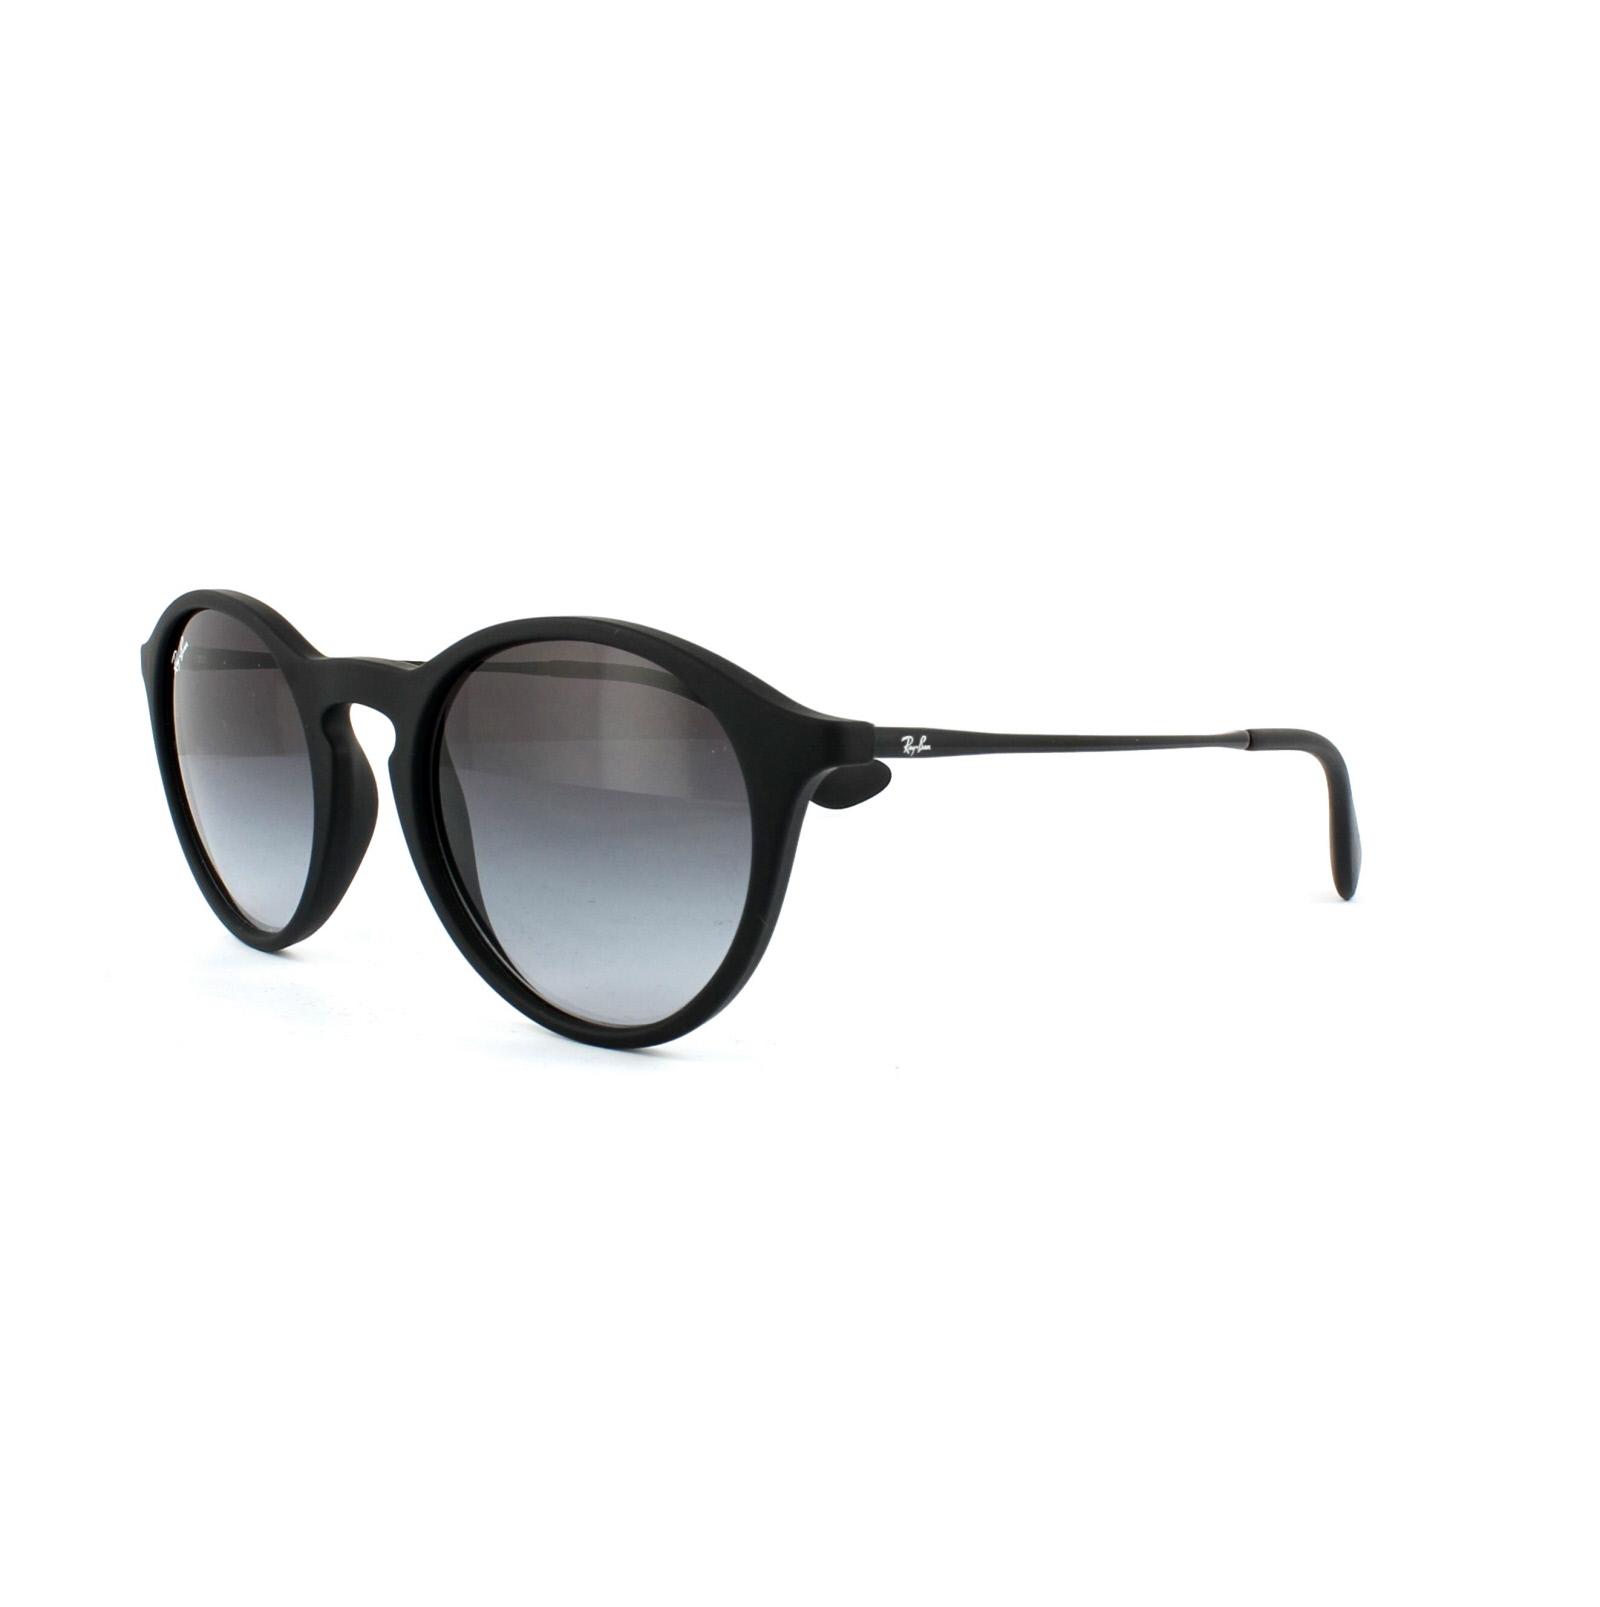 0e7429a1d6 Cheap Ray-Ban 4243 Sunglasses - Discounted Sunglasses